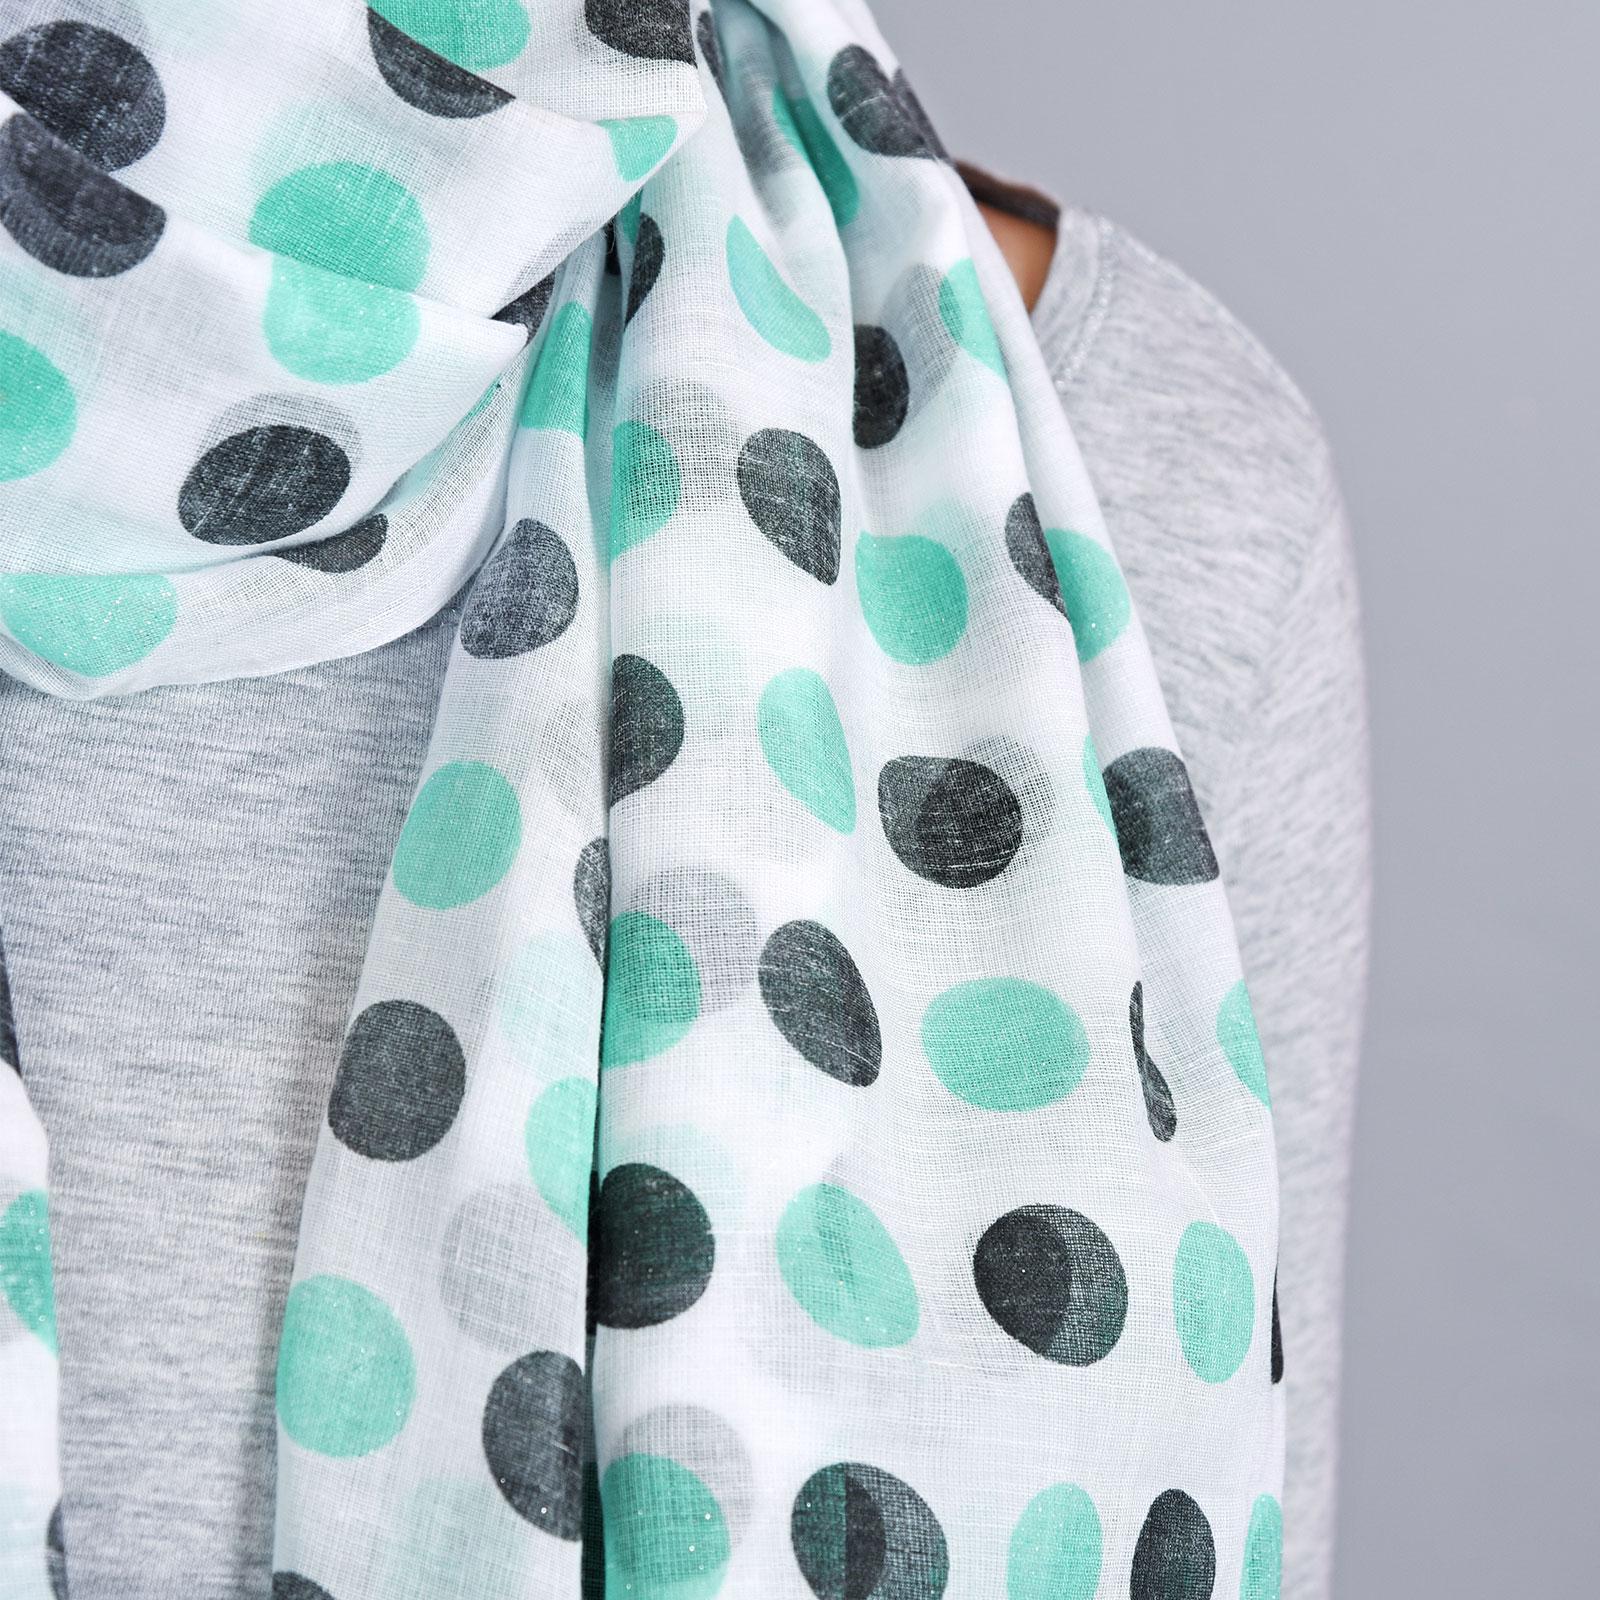 AT-04322-VF16-2-foulard-femme-pois-aqua-noir